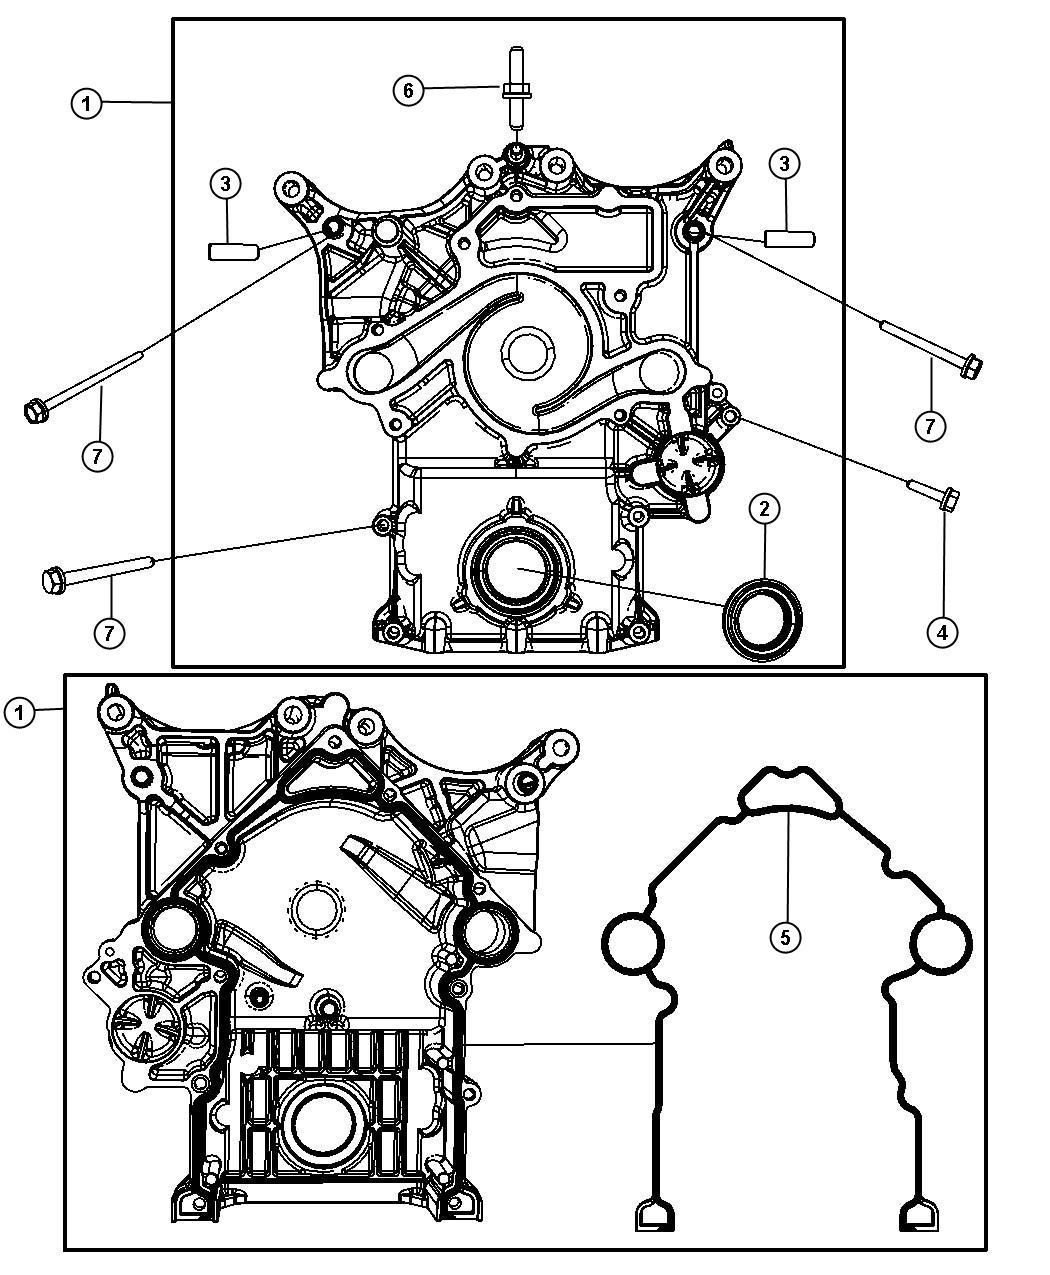 2009 Dodge Ram 3500 Cover. Timing case. Engine, mds, hemi ...